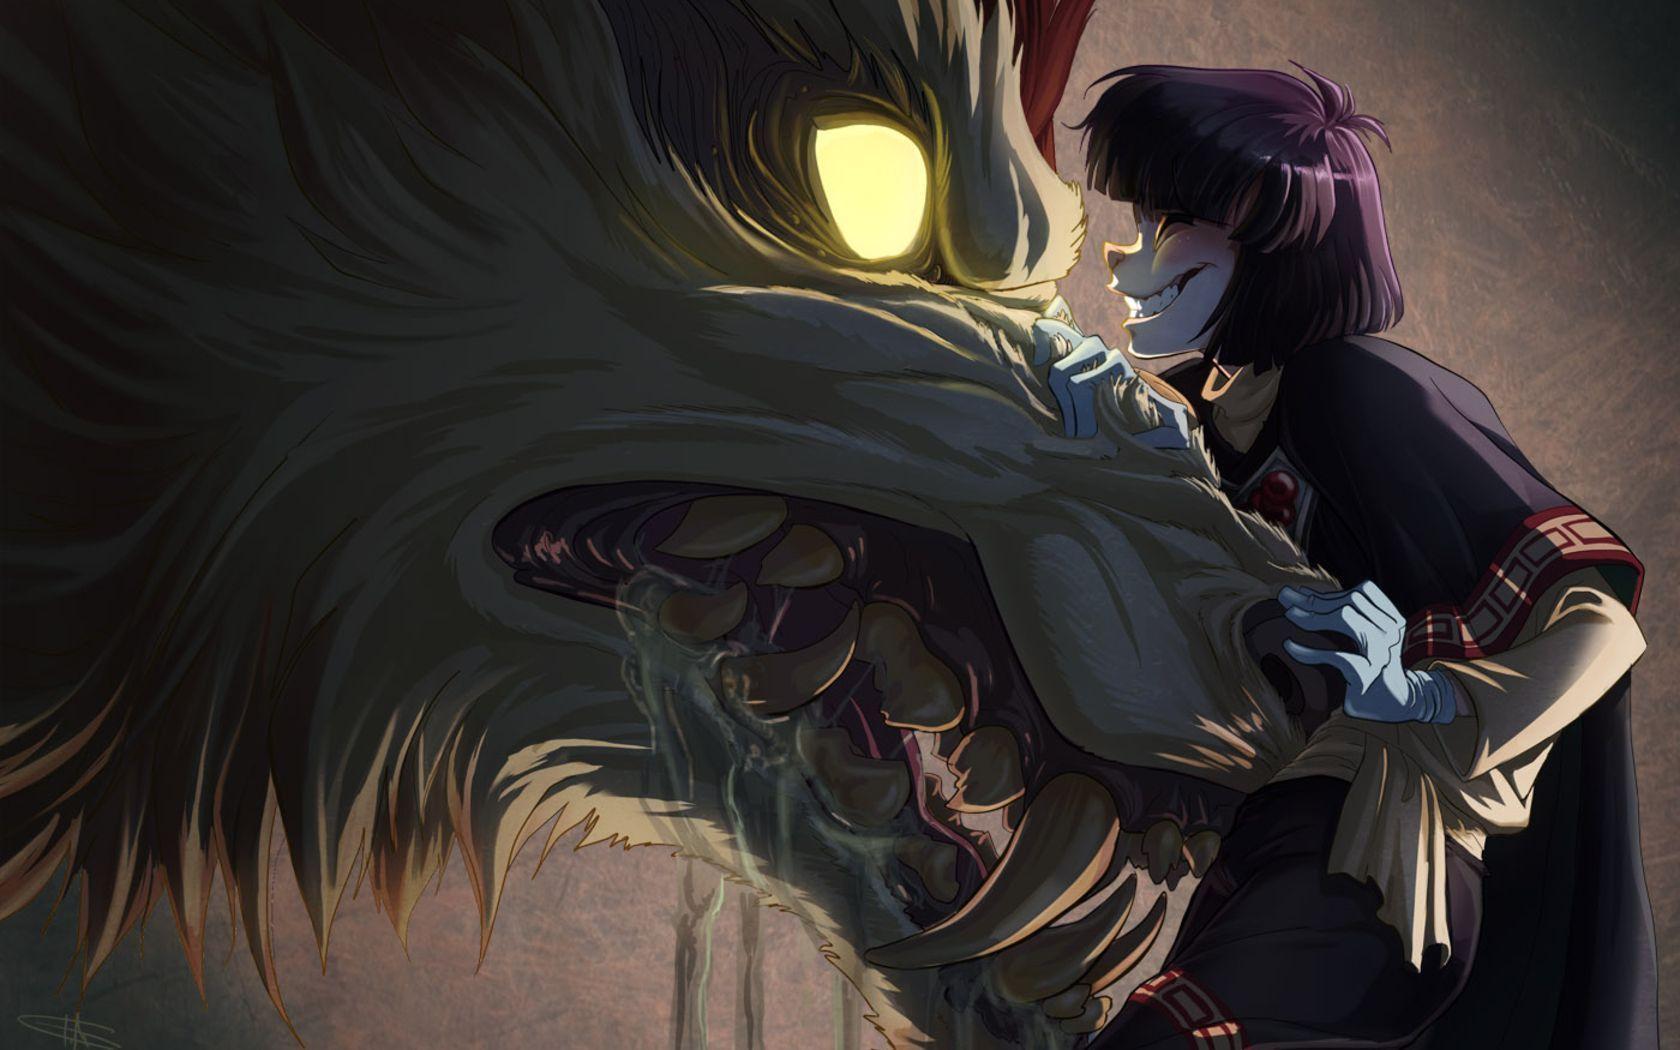 Anime Werewolf Wallpapers Top Free Anime Werewolf Backgrounds Wallpaperaccess